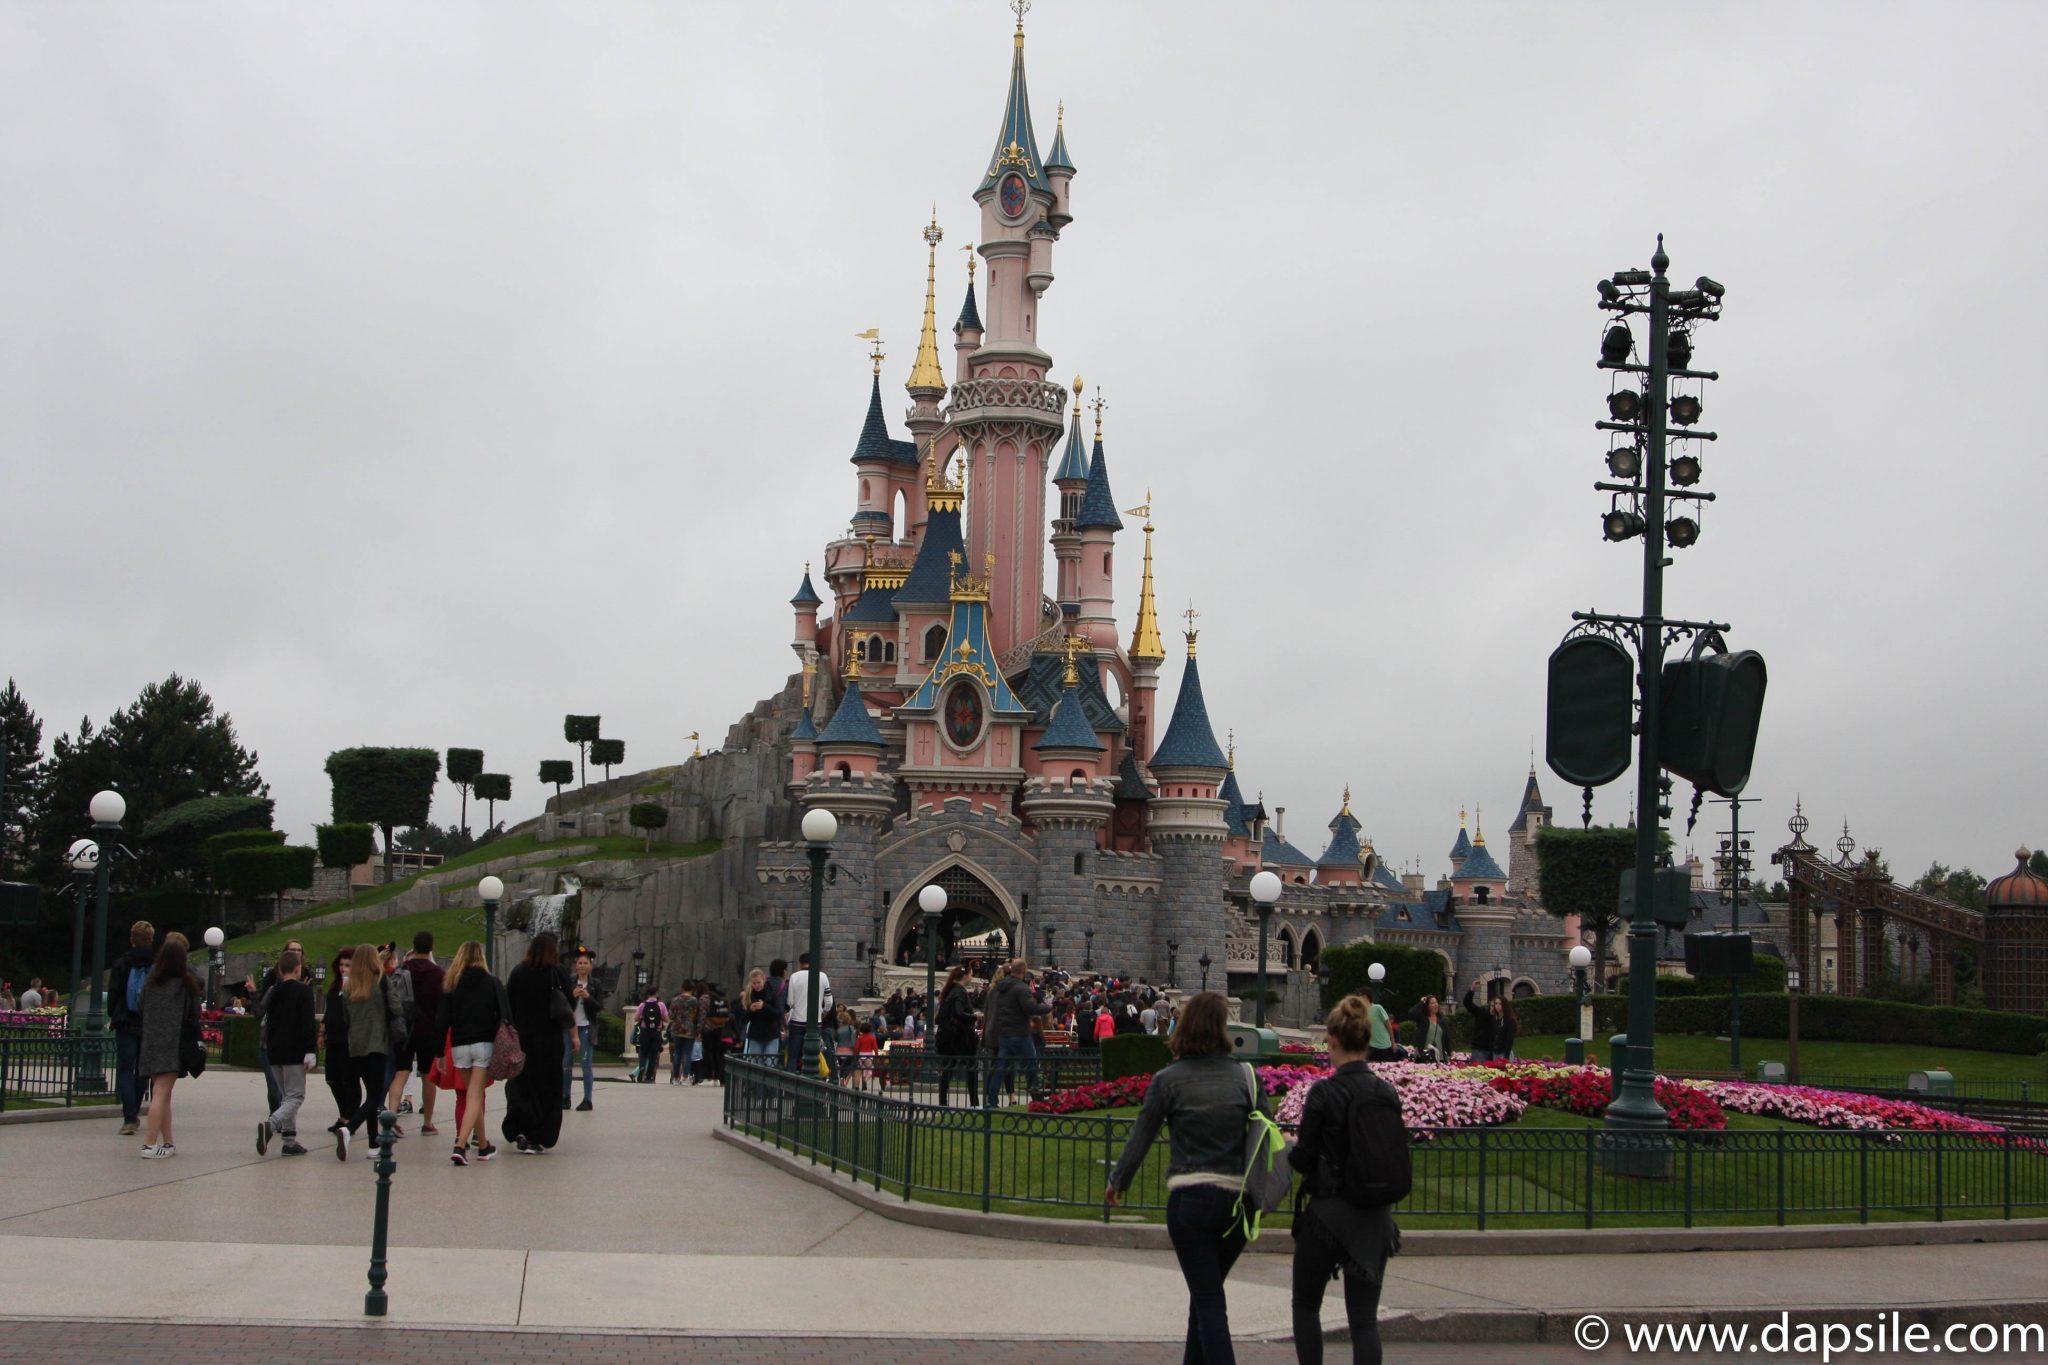 Cinderella Castle in Disneyland Paris Sights